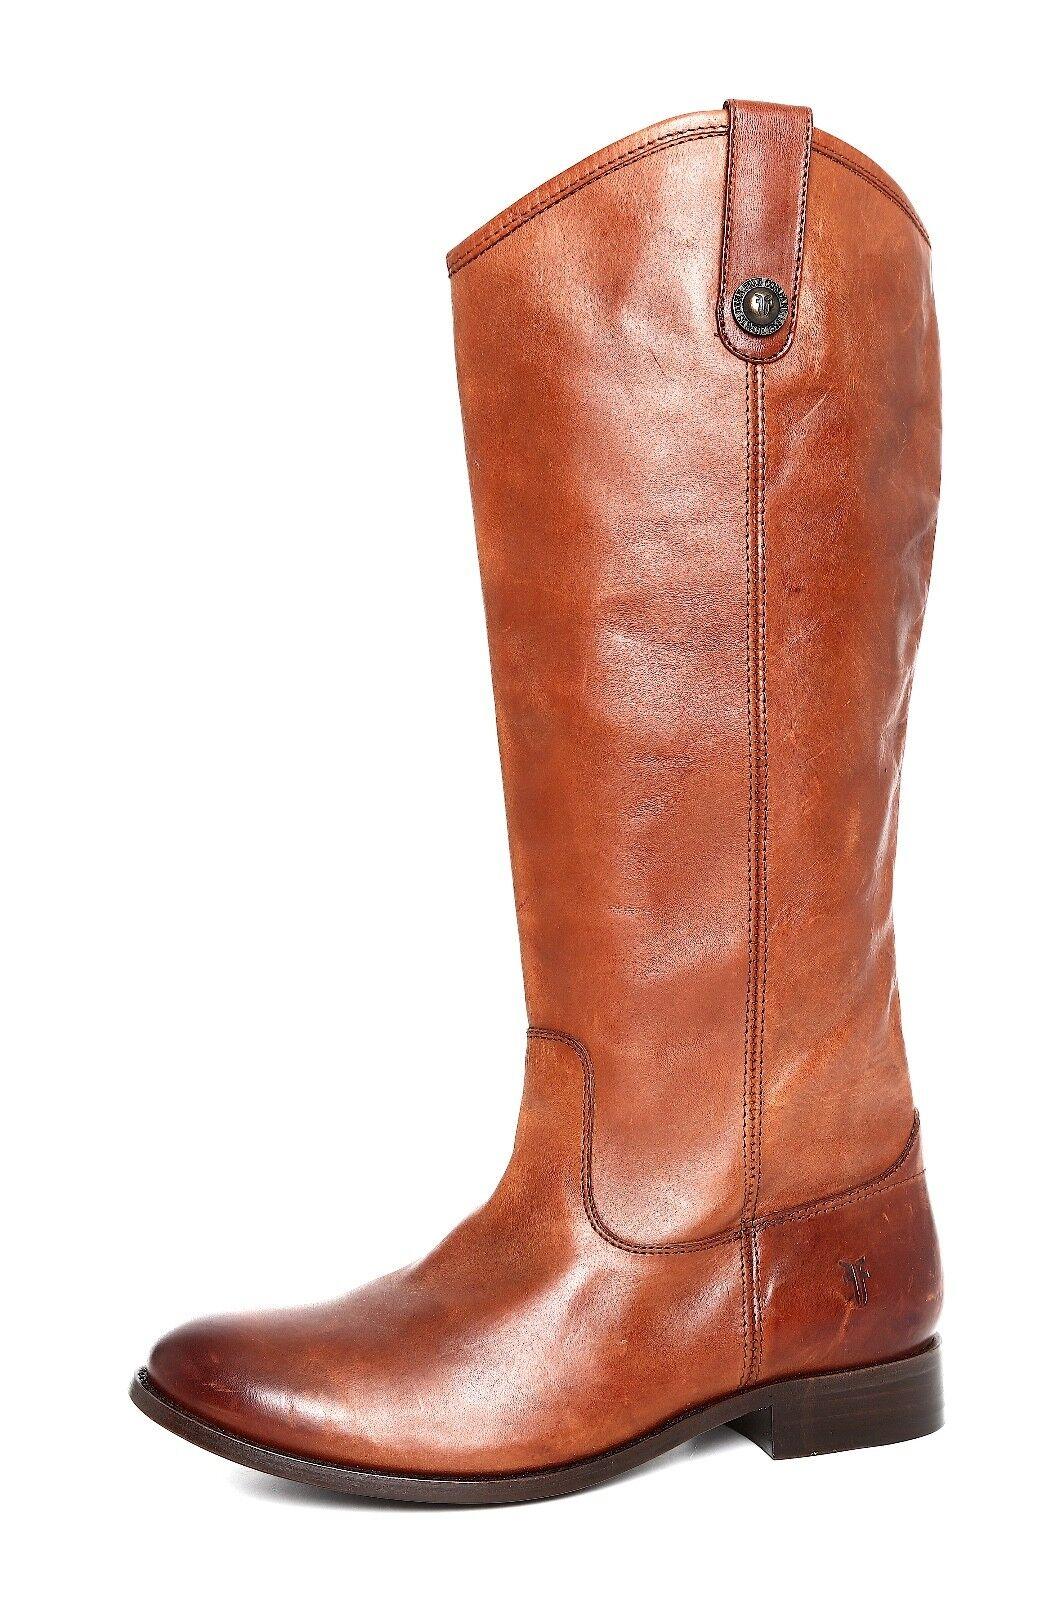 Frye Melissa Button Leather Riding Boot Brown Women Sz 8 B 5875 *